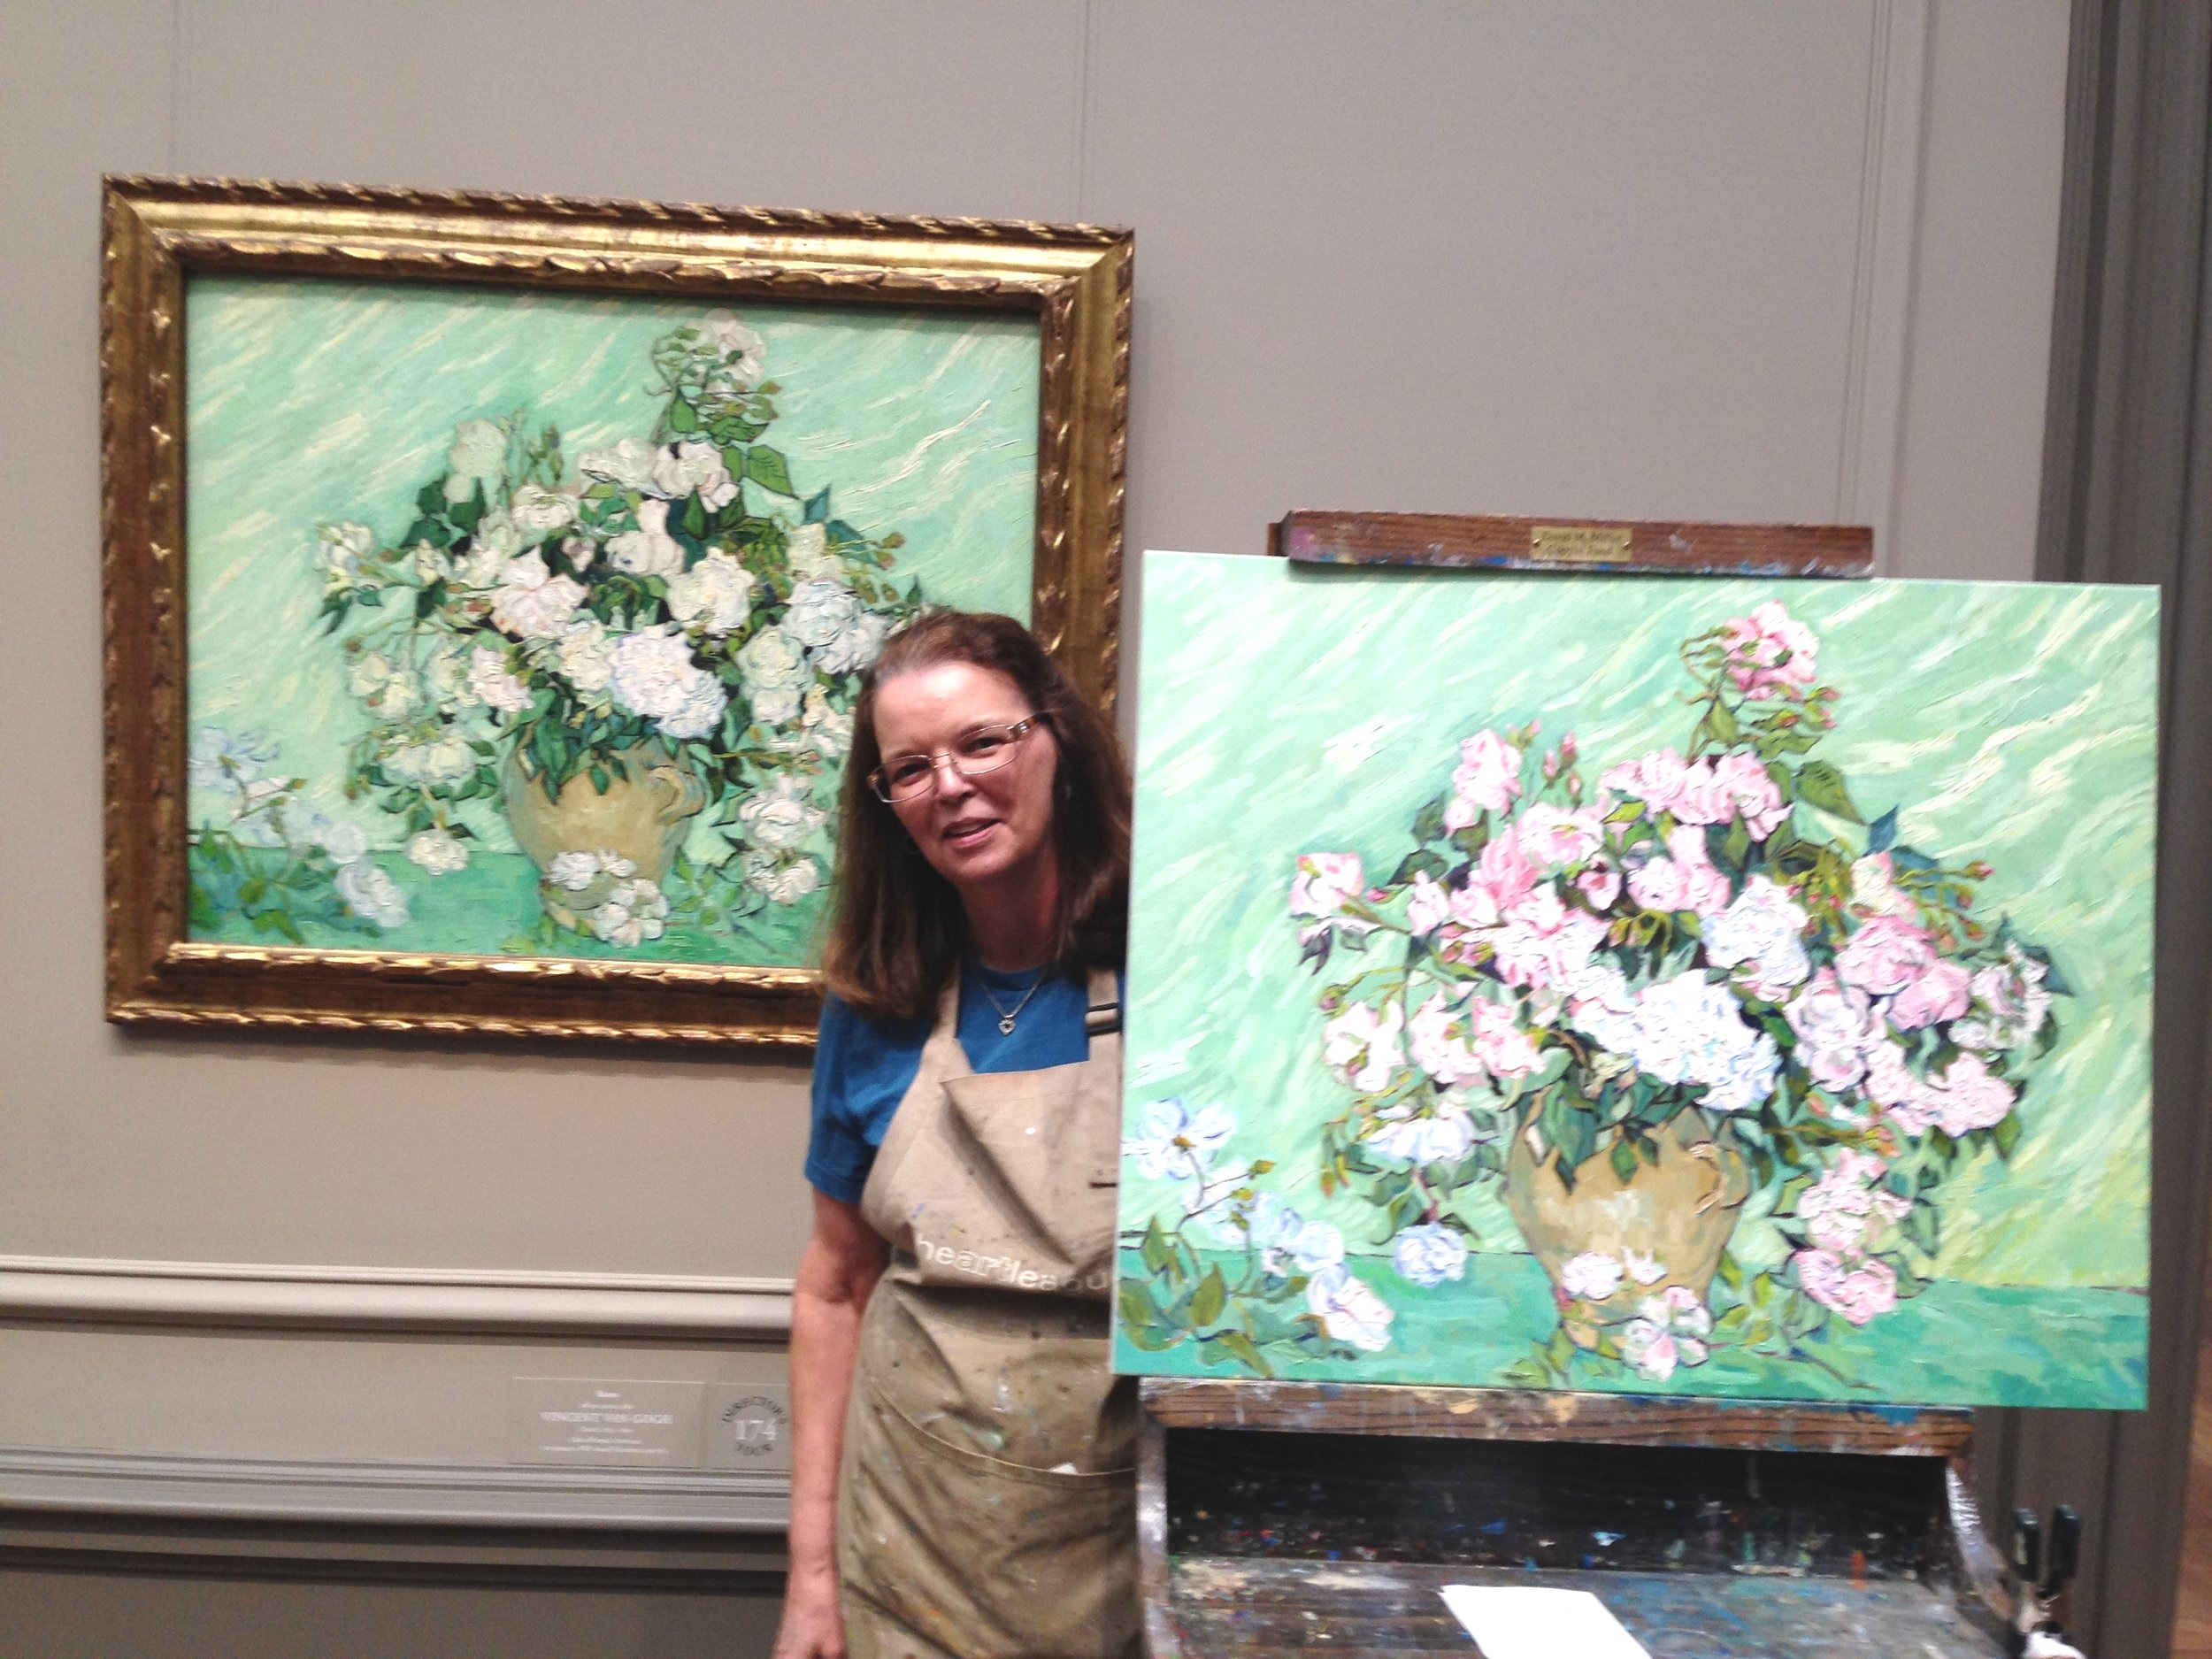 Copy of Van Gogh's Roses in progress